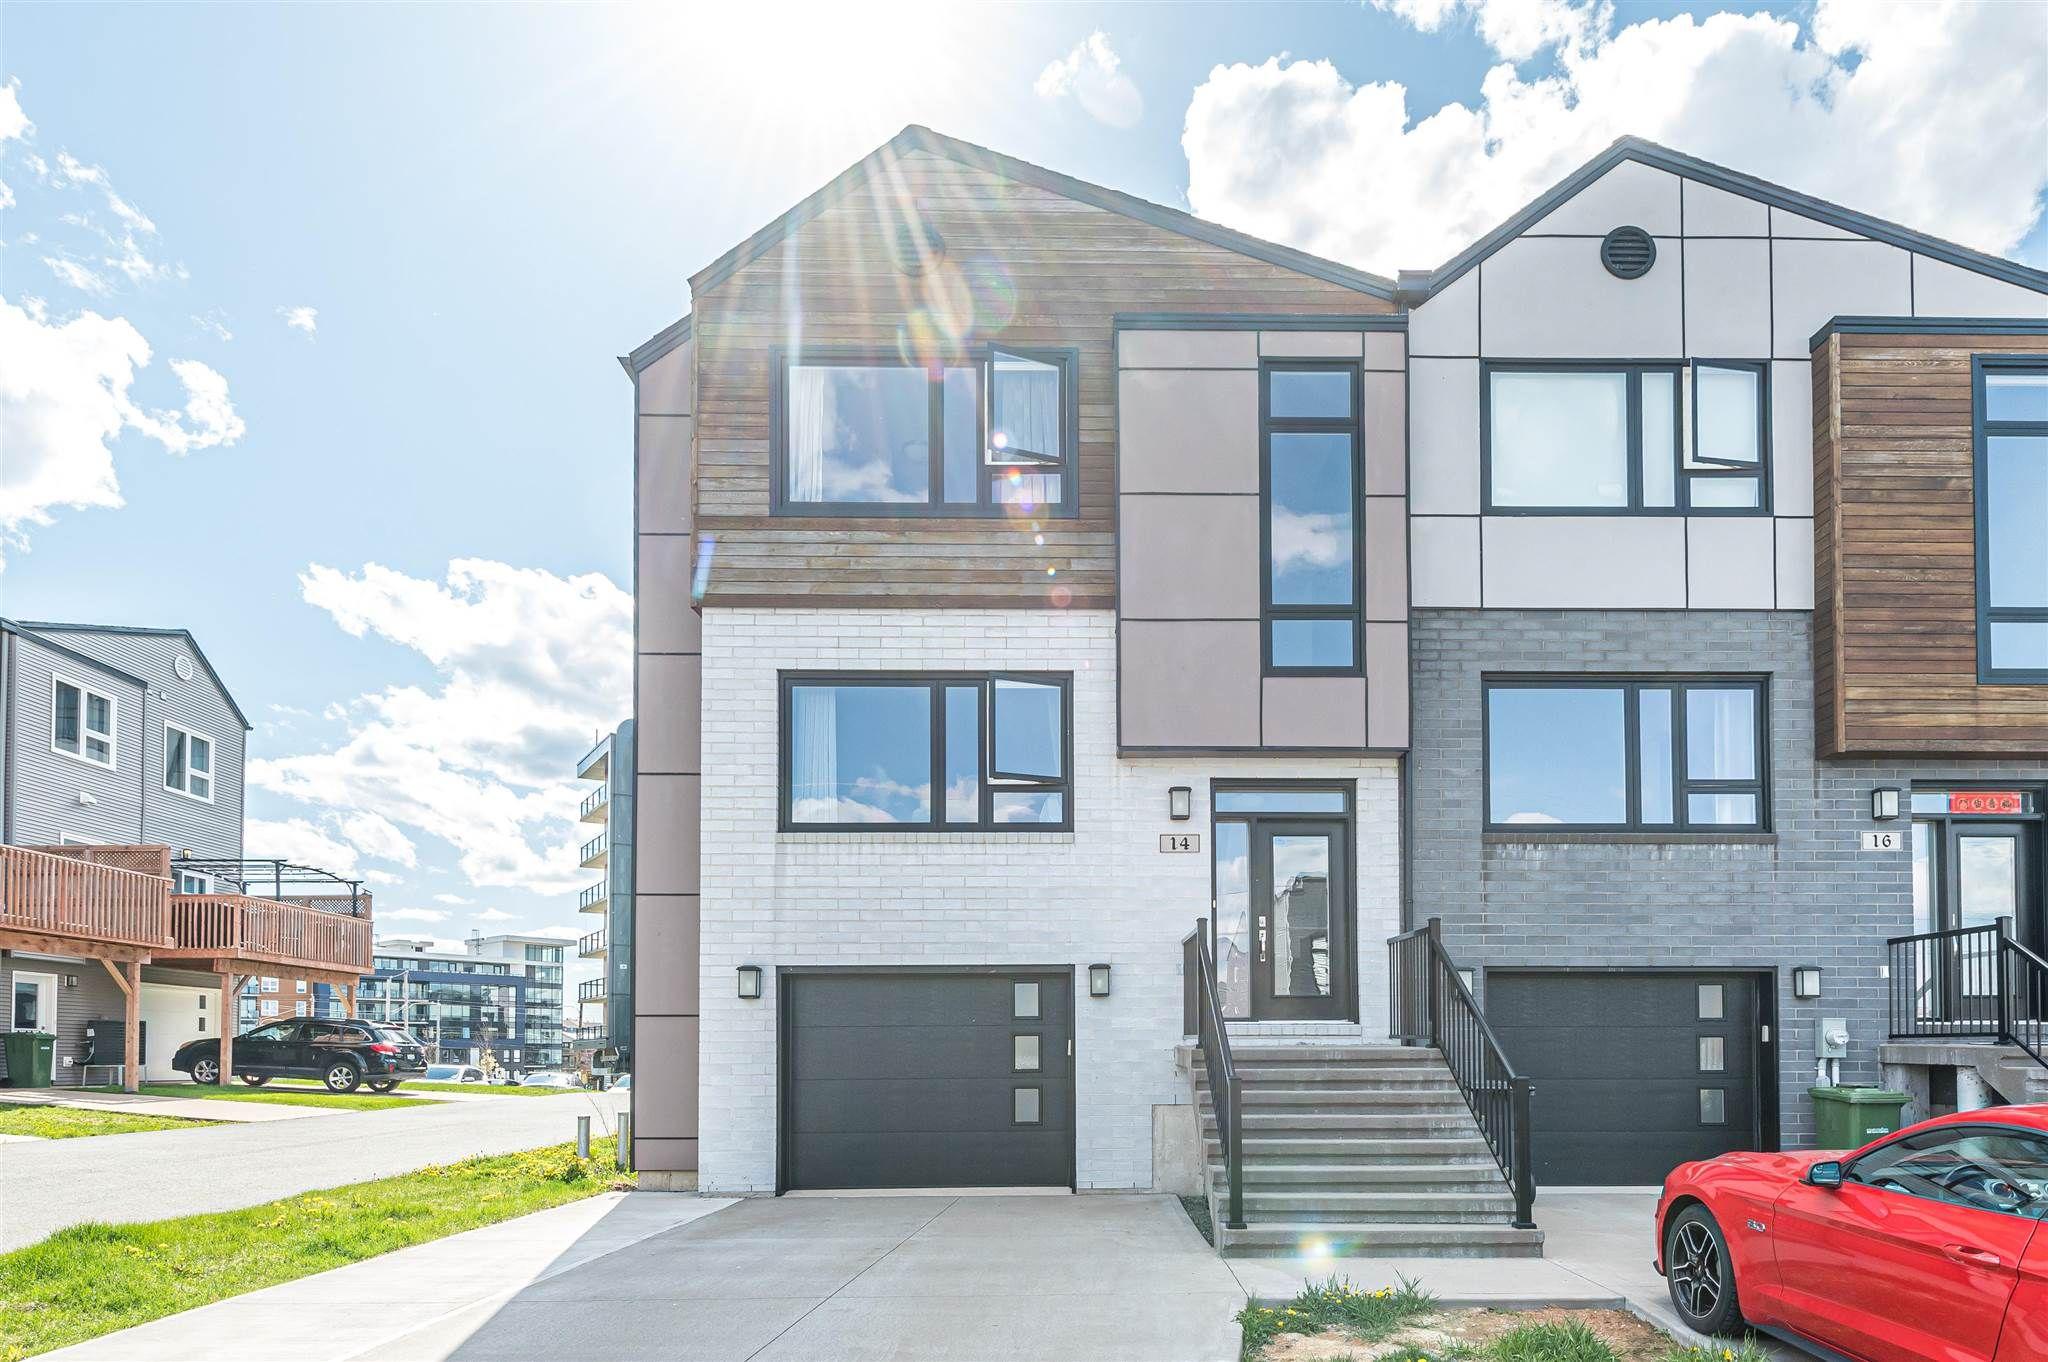 Main Photo: 14 Carrie Best Court in Halifax: 5-Fairmount, Clayton Park, Rockingham Residential for sale (Halifax-Dartmouth)  : MLS®# 202114806